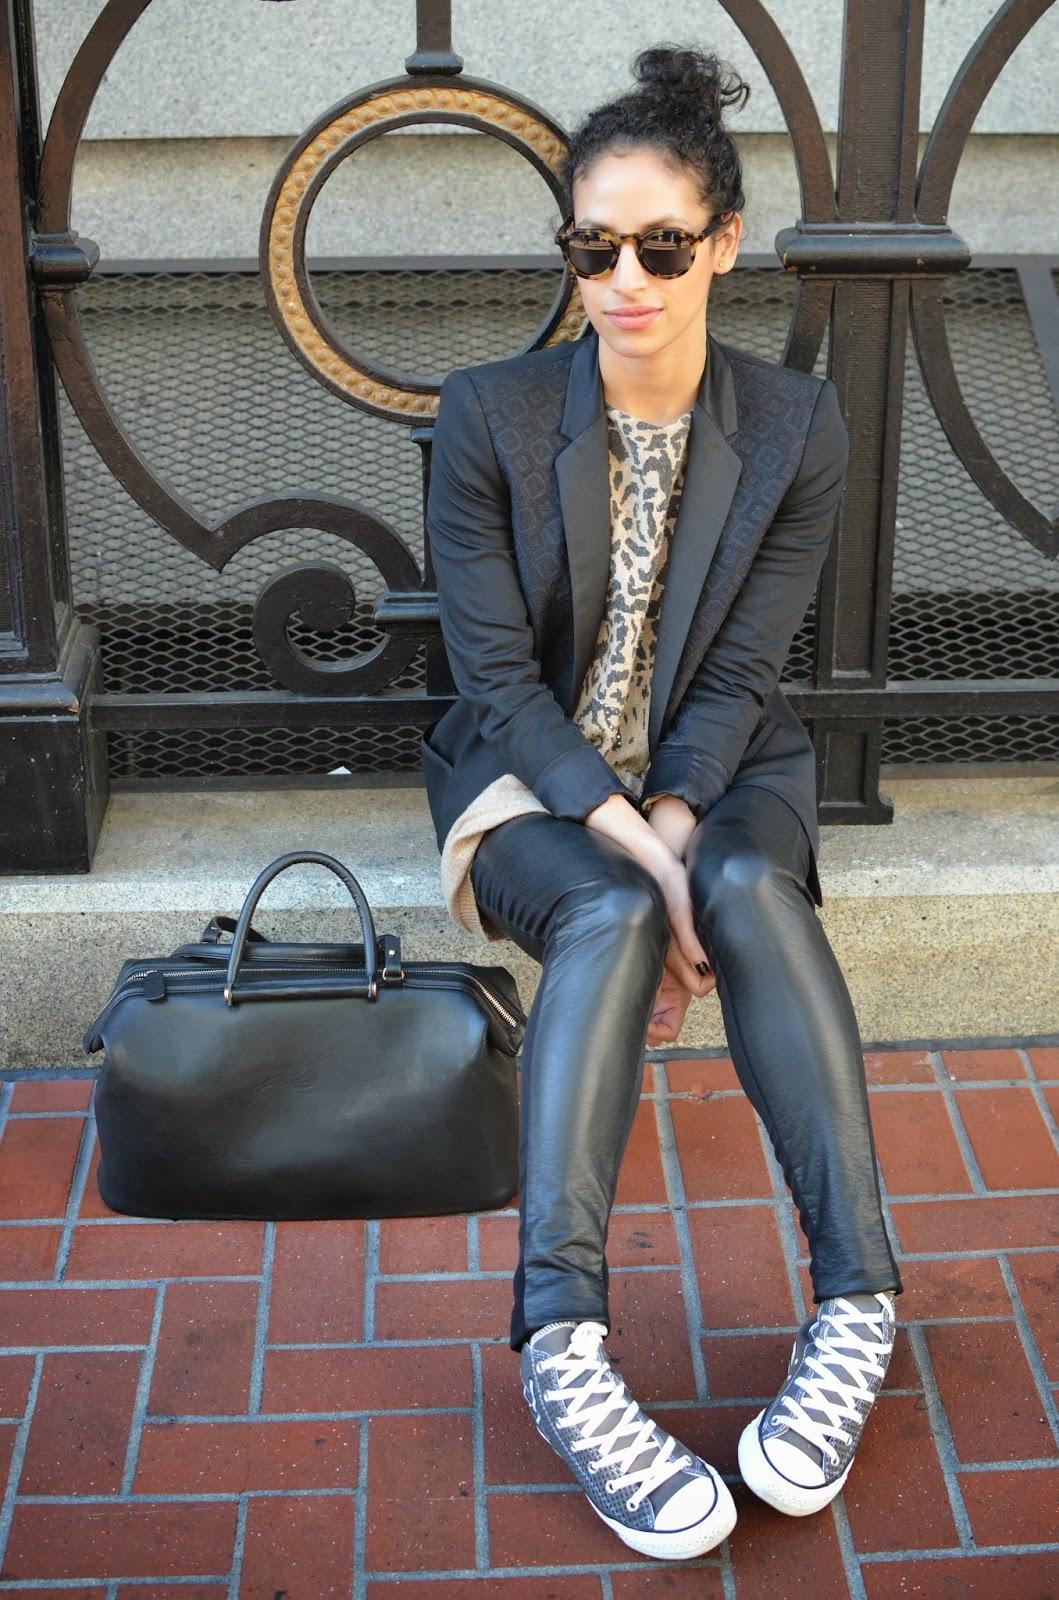 b2e497e21c7901 {Zara blazer (need this Wang one!), ShopSeptember sweater c/o, H&M leather  pants, custom Converse c/o, handbag from Prague, Bare Minerals lipstick:  Break ...